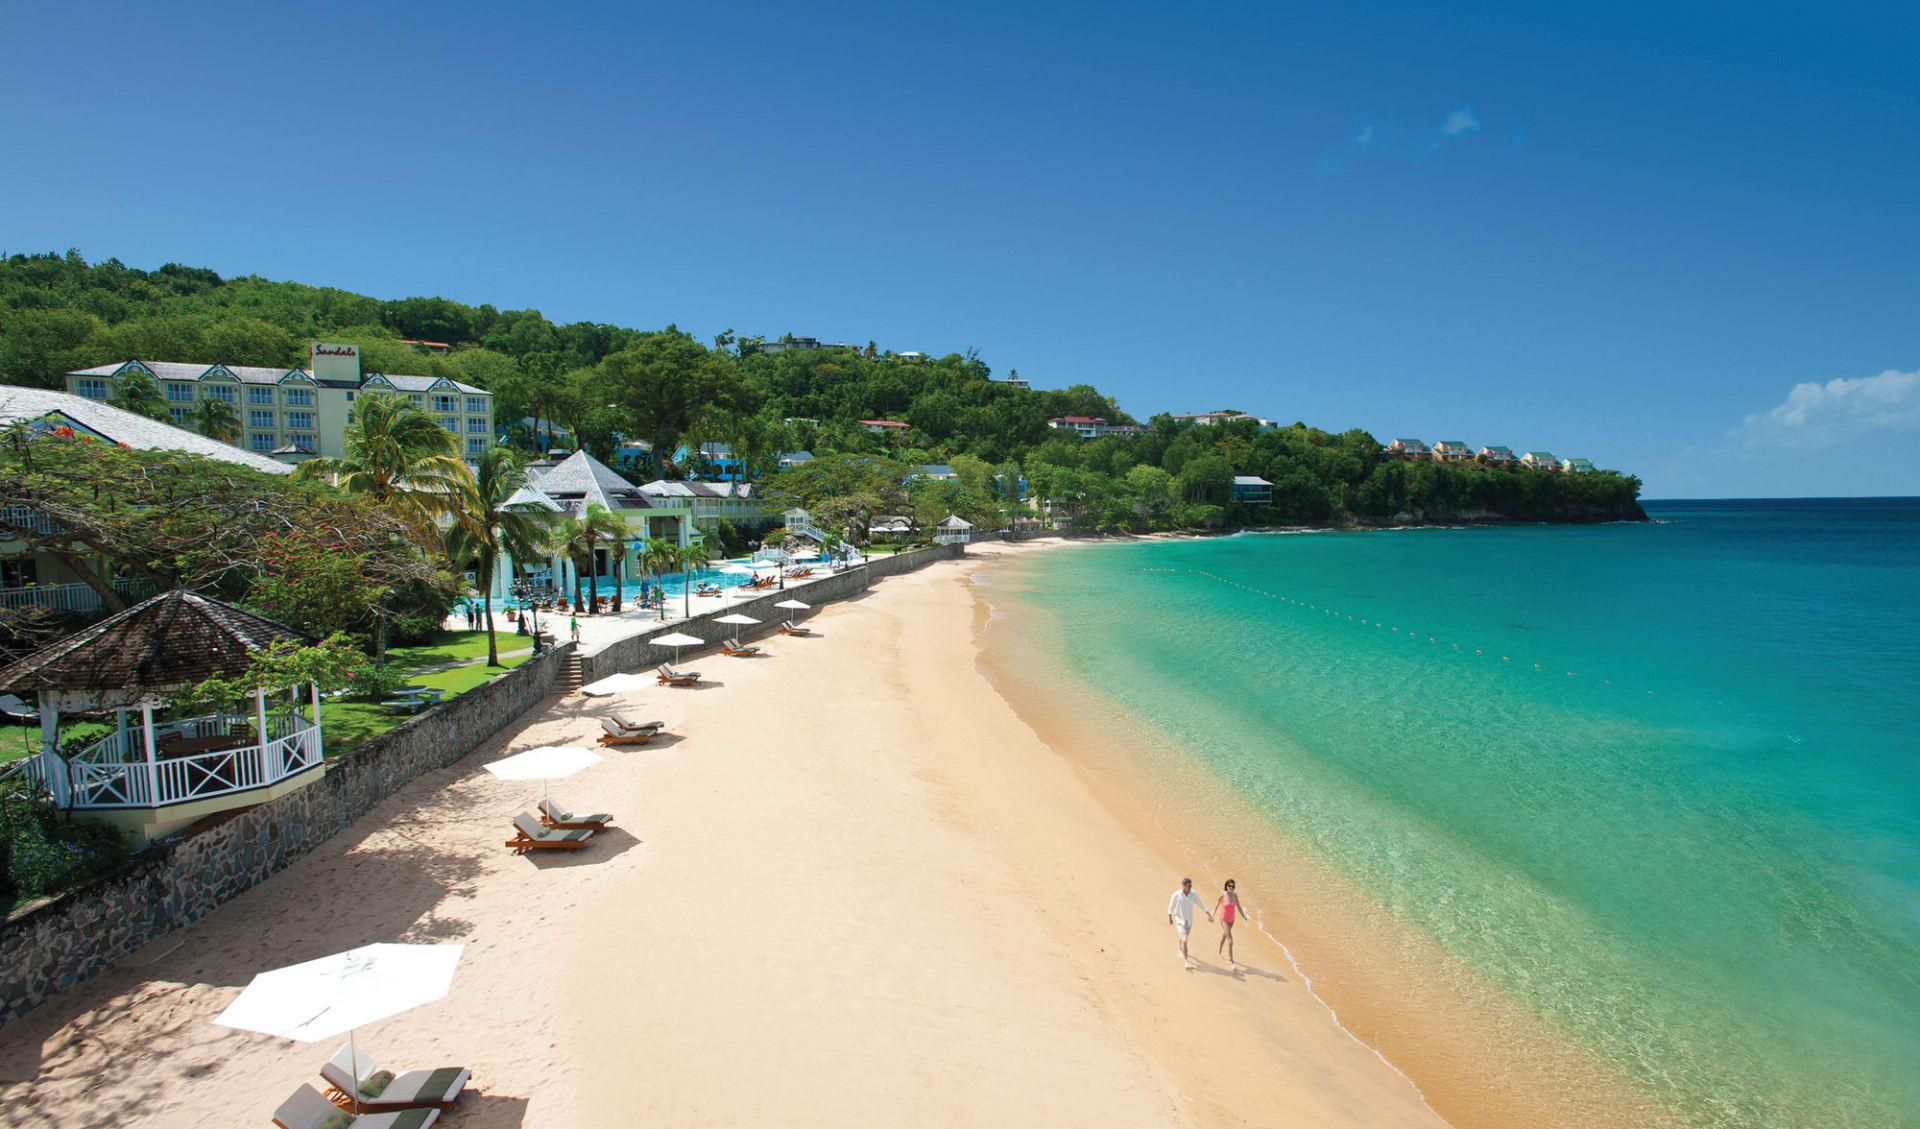 Sandals Regency La Toc Golf Resort & Spa in Castries: Exterior Sandals La Toc St. Lucia - Beach c Sandals